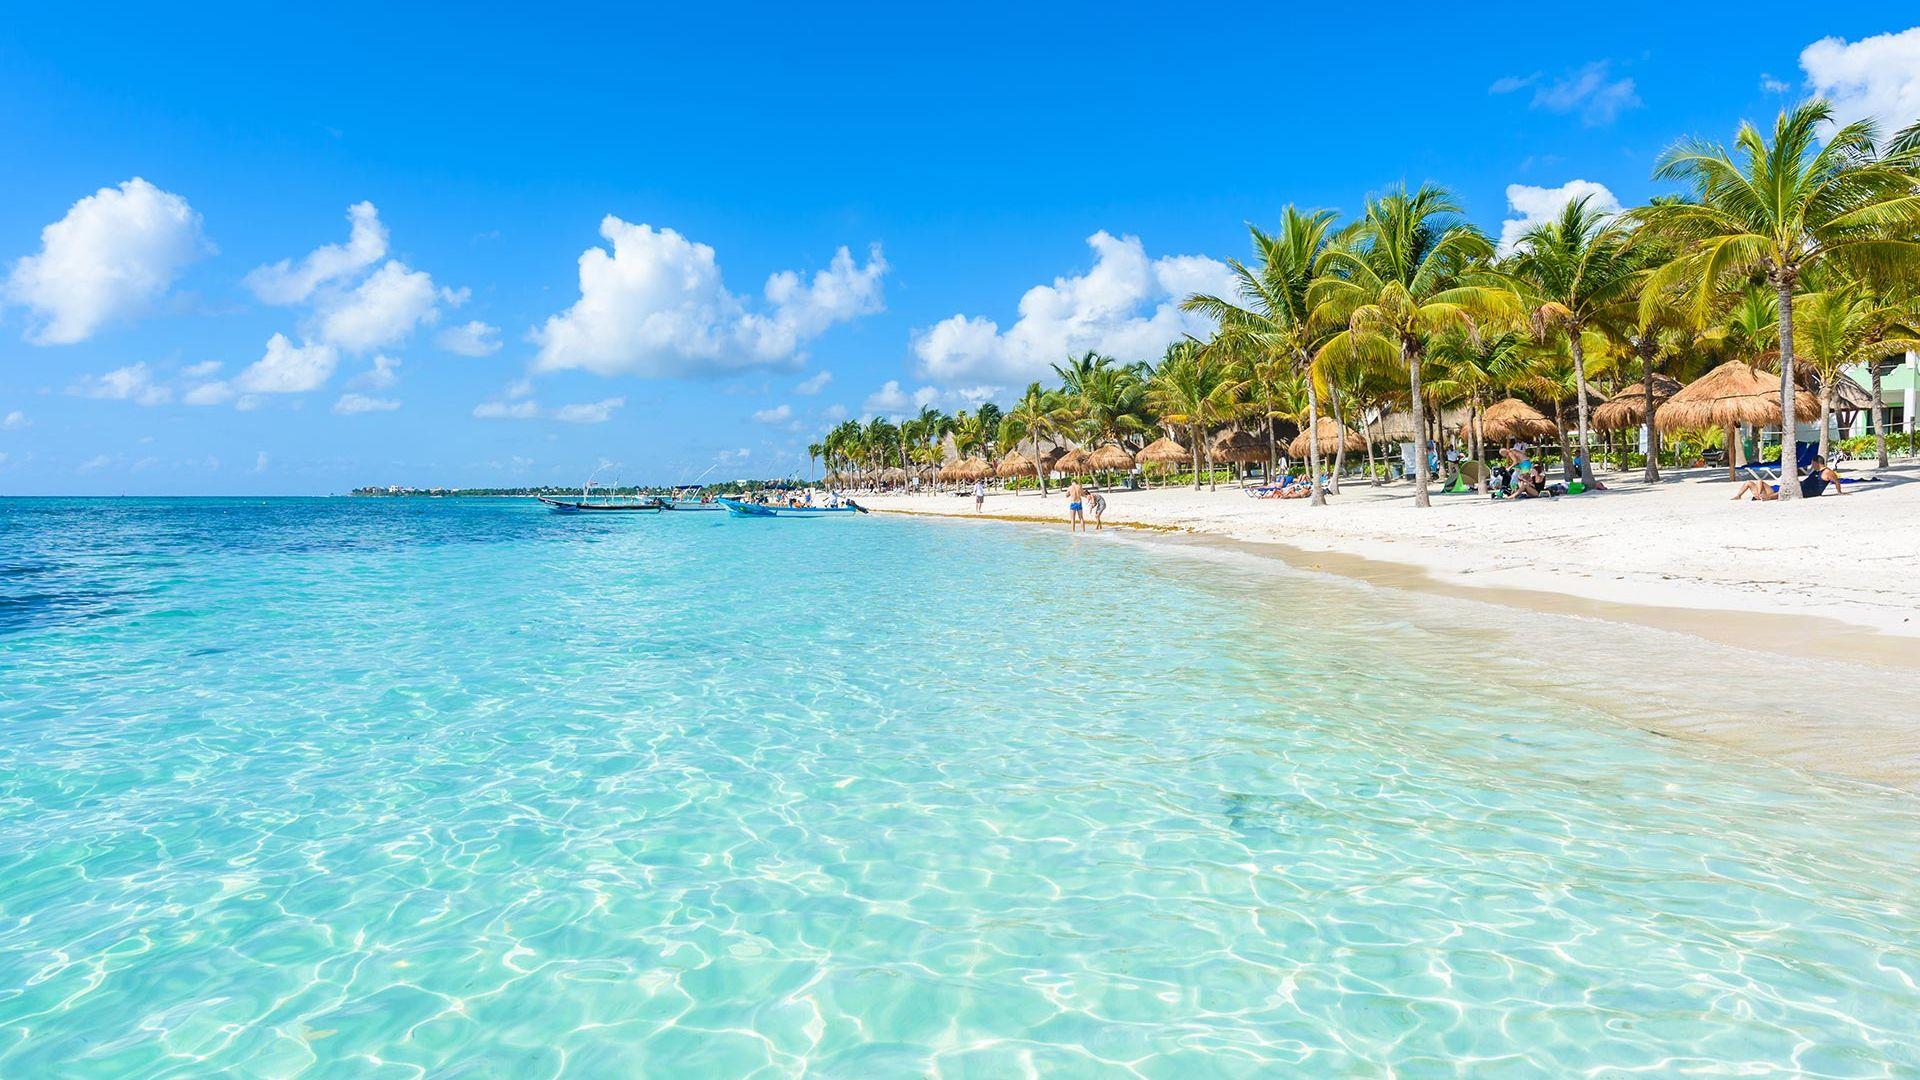 Paste 2022 - Sejur plaja Riviera Maya, Mexic, 9 zile